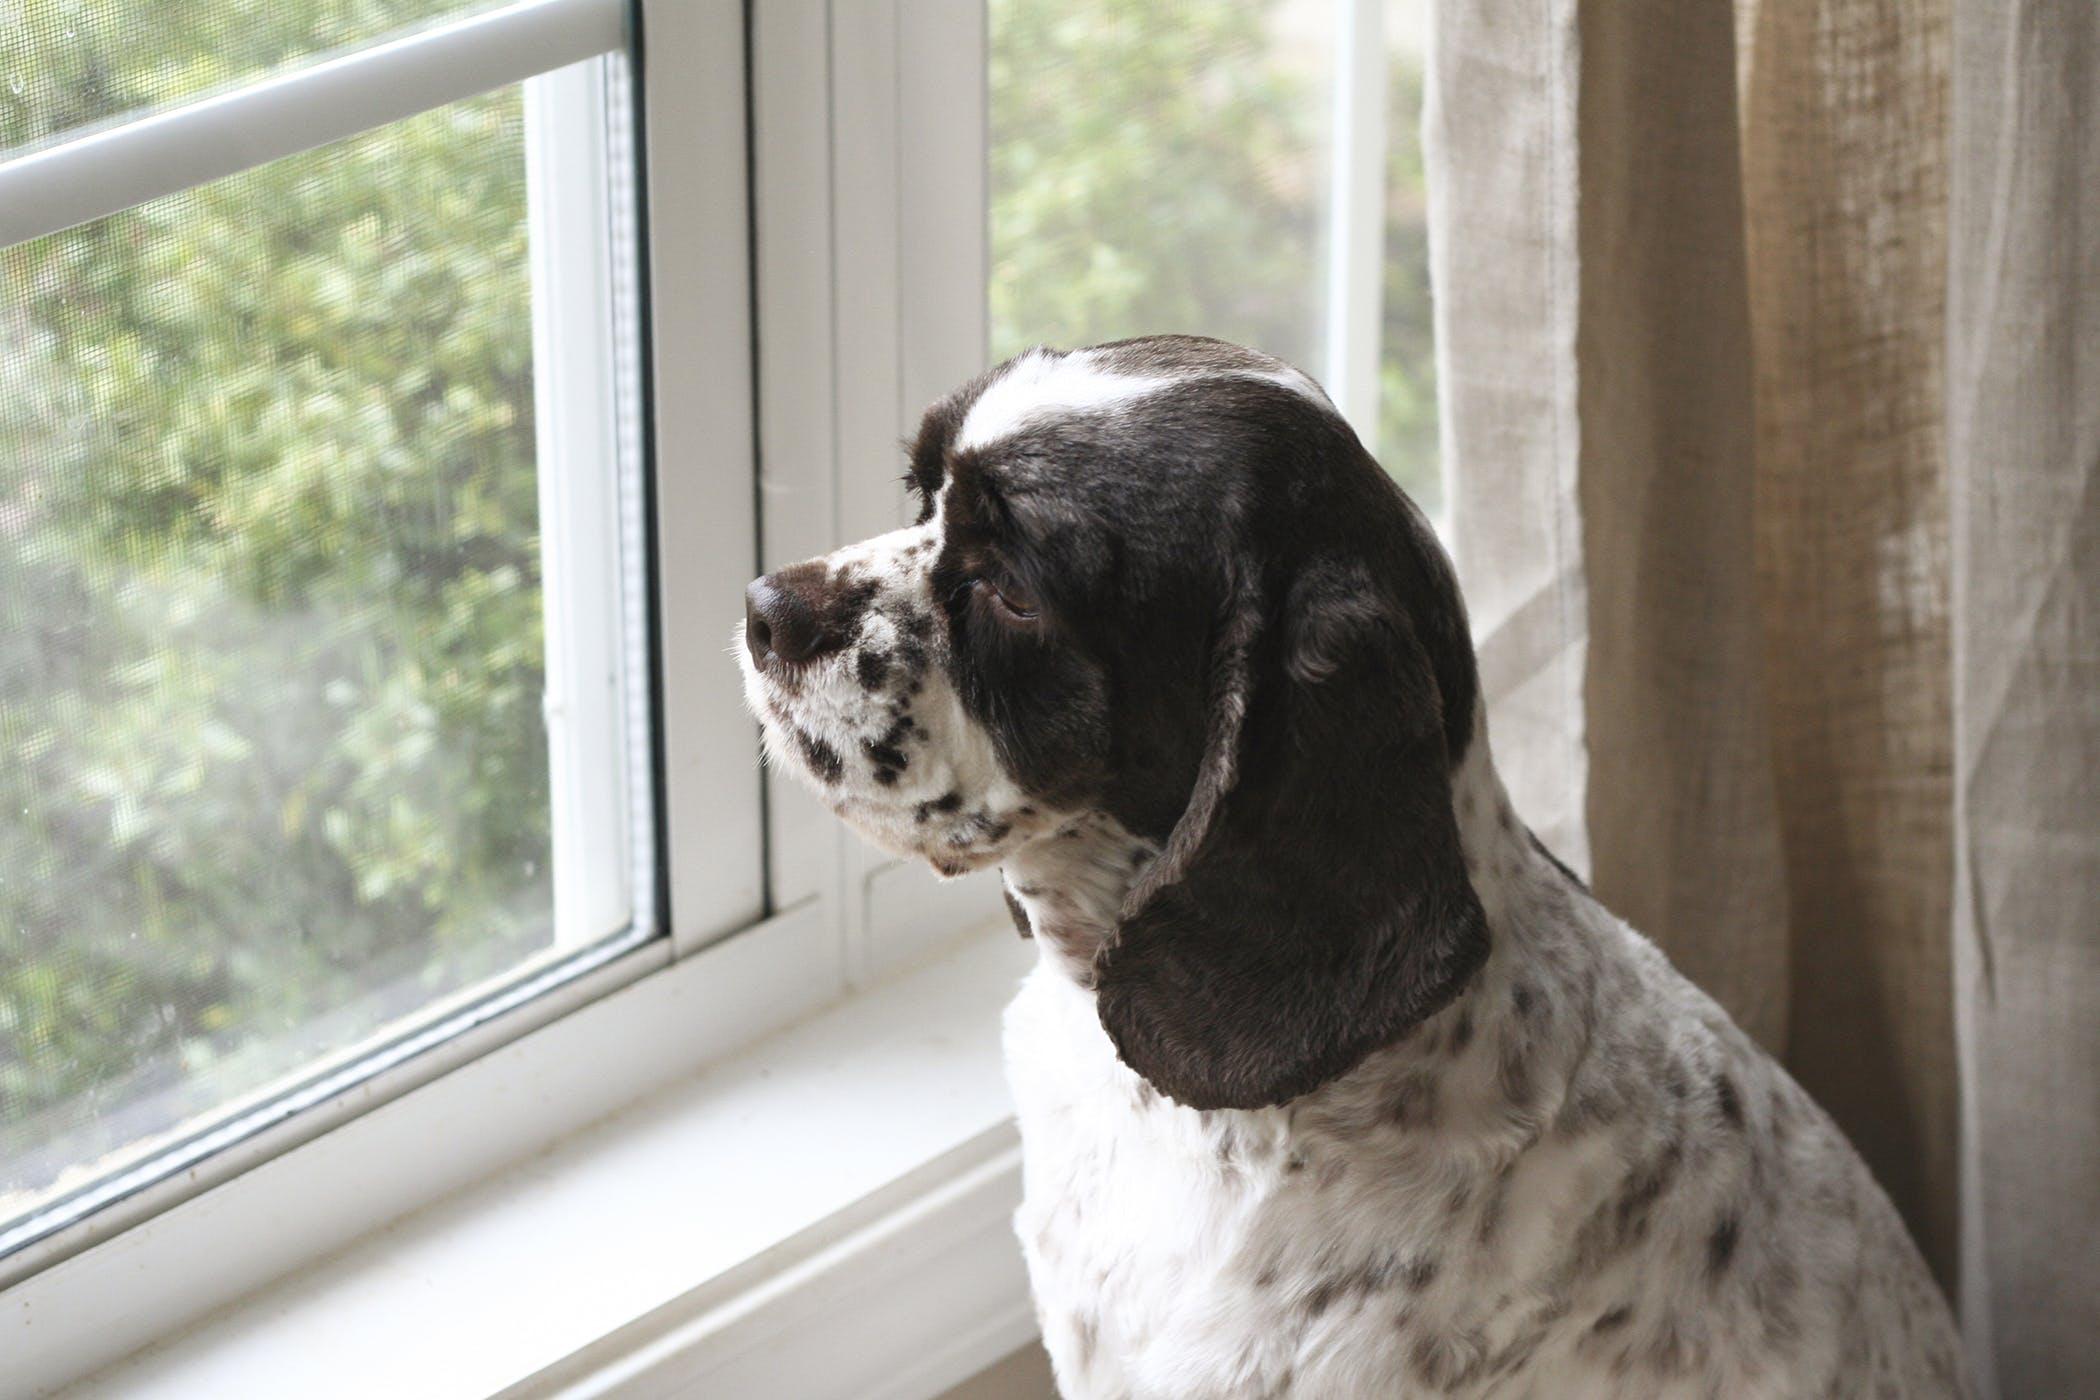 Acute Leukemia in Dogs - Symptoms, Causes, Diagnosis